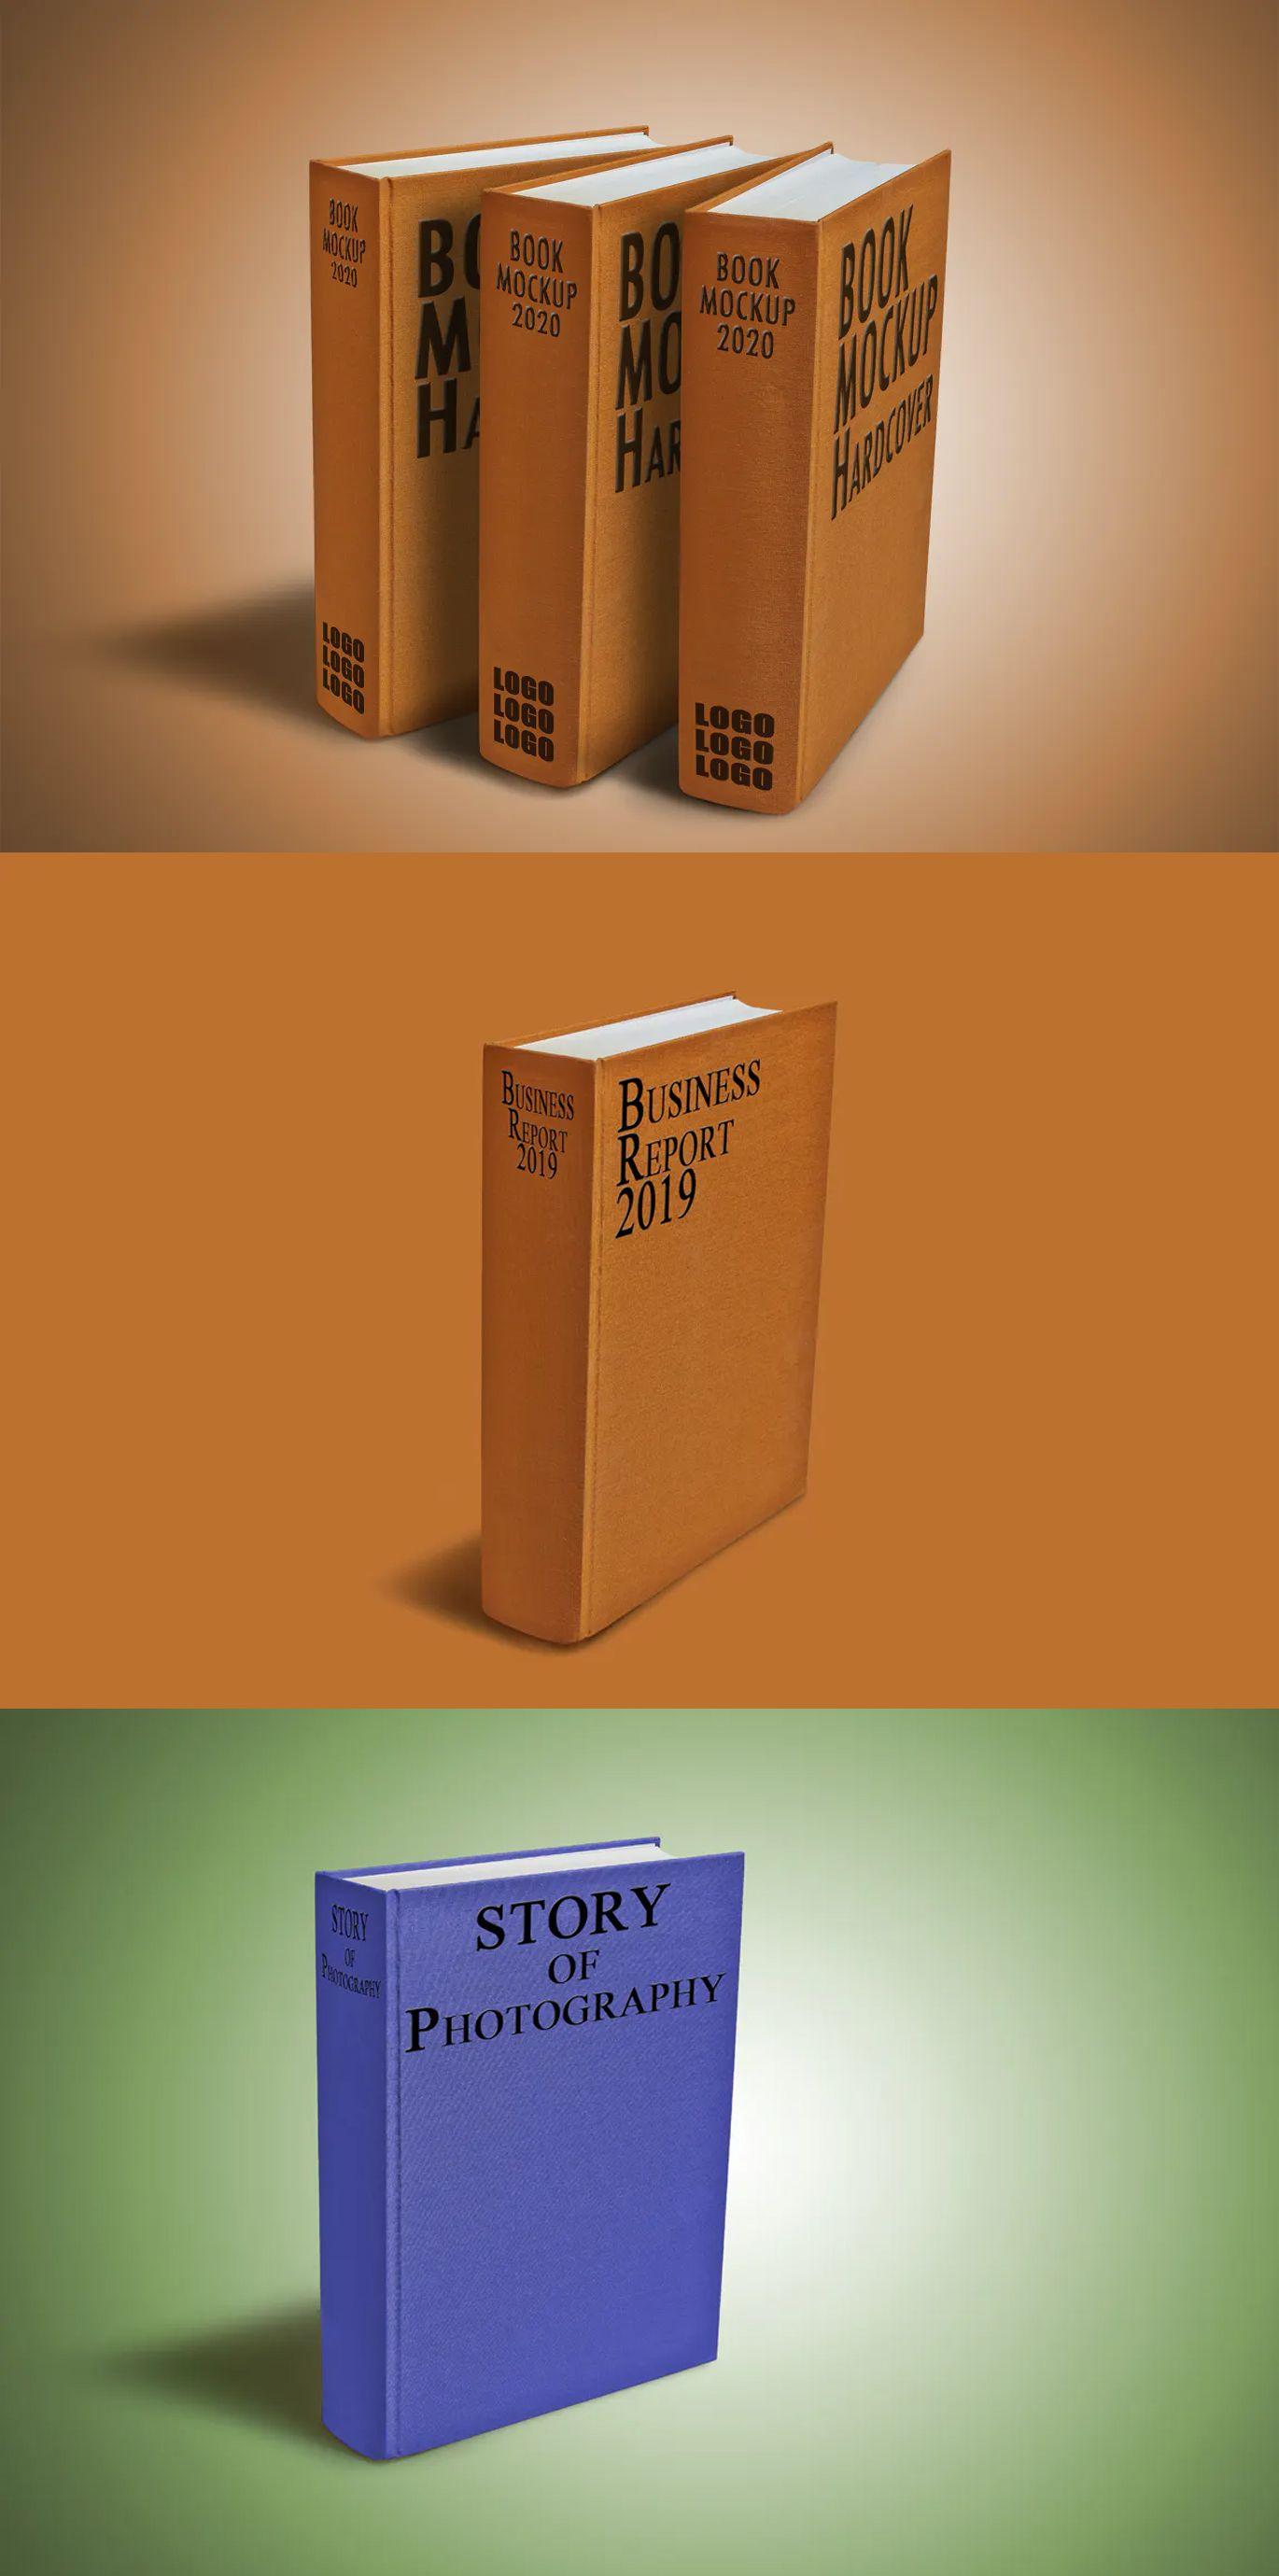 Download Hardcover Book Mockup Hardcover Book Hardcover Books